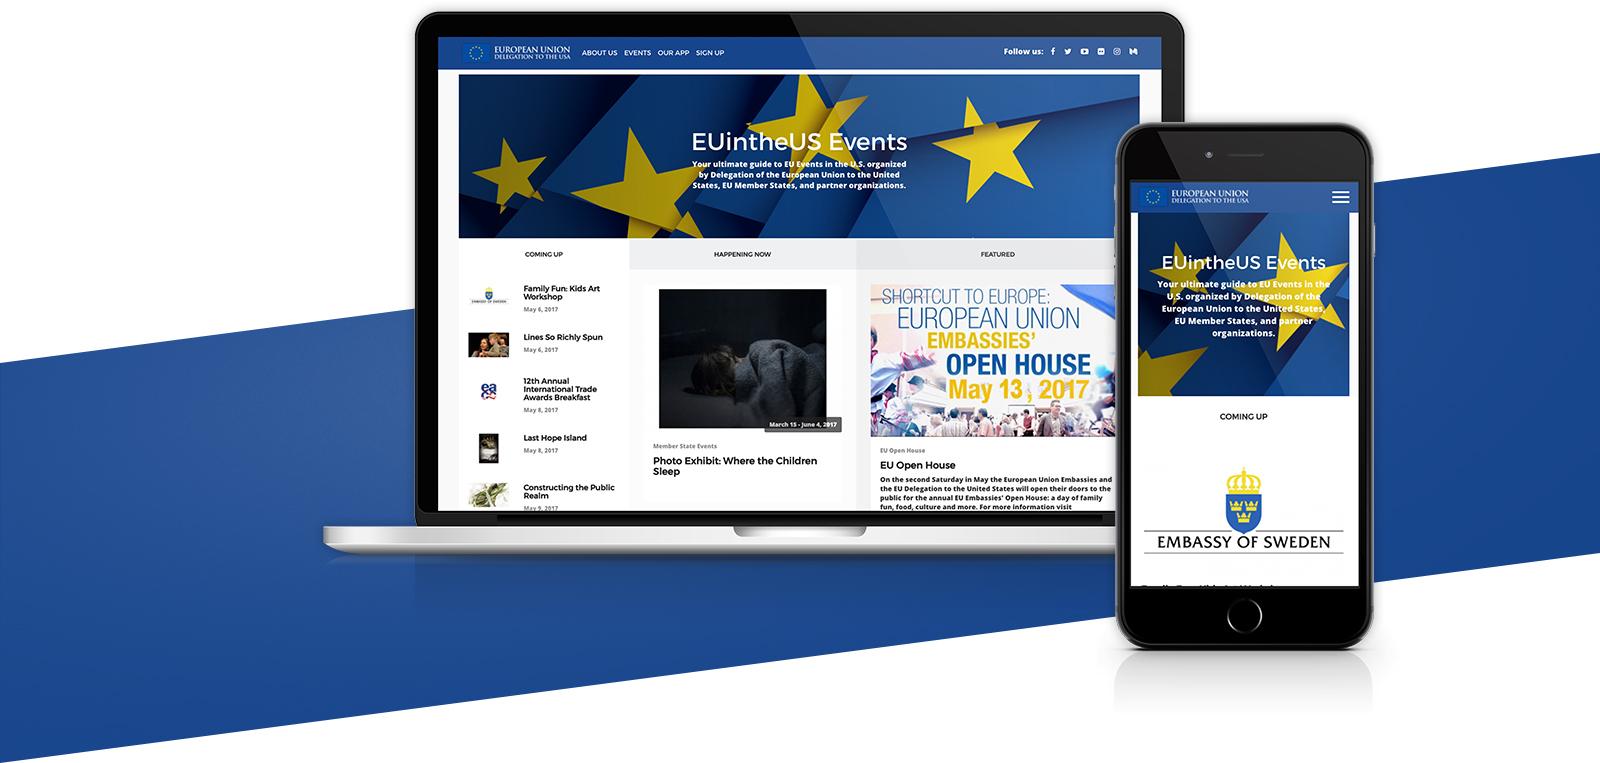 European Union image